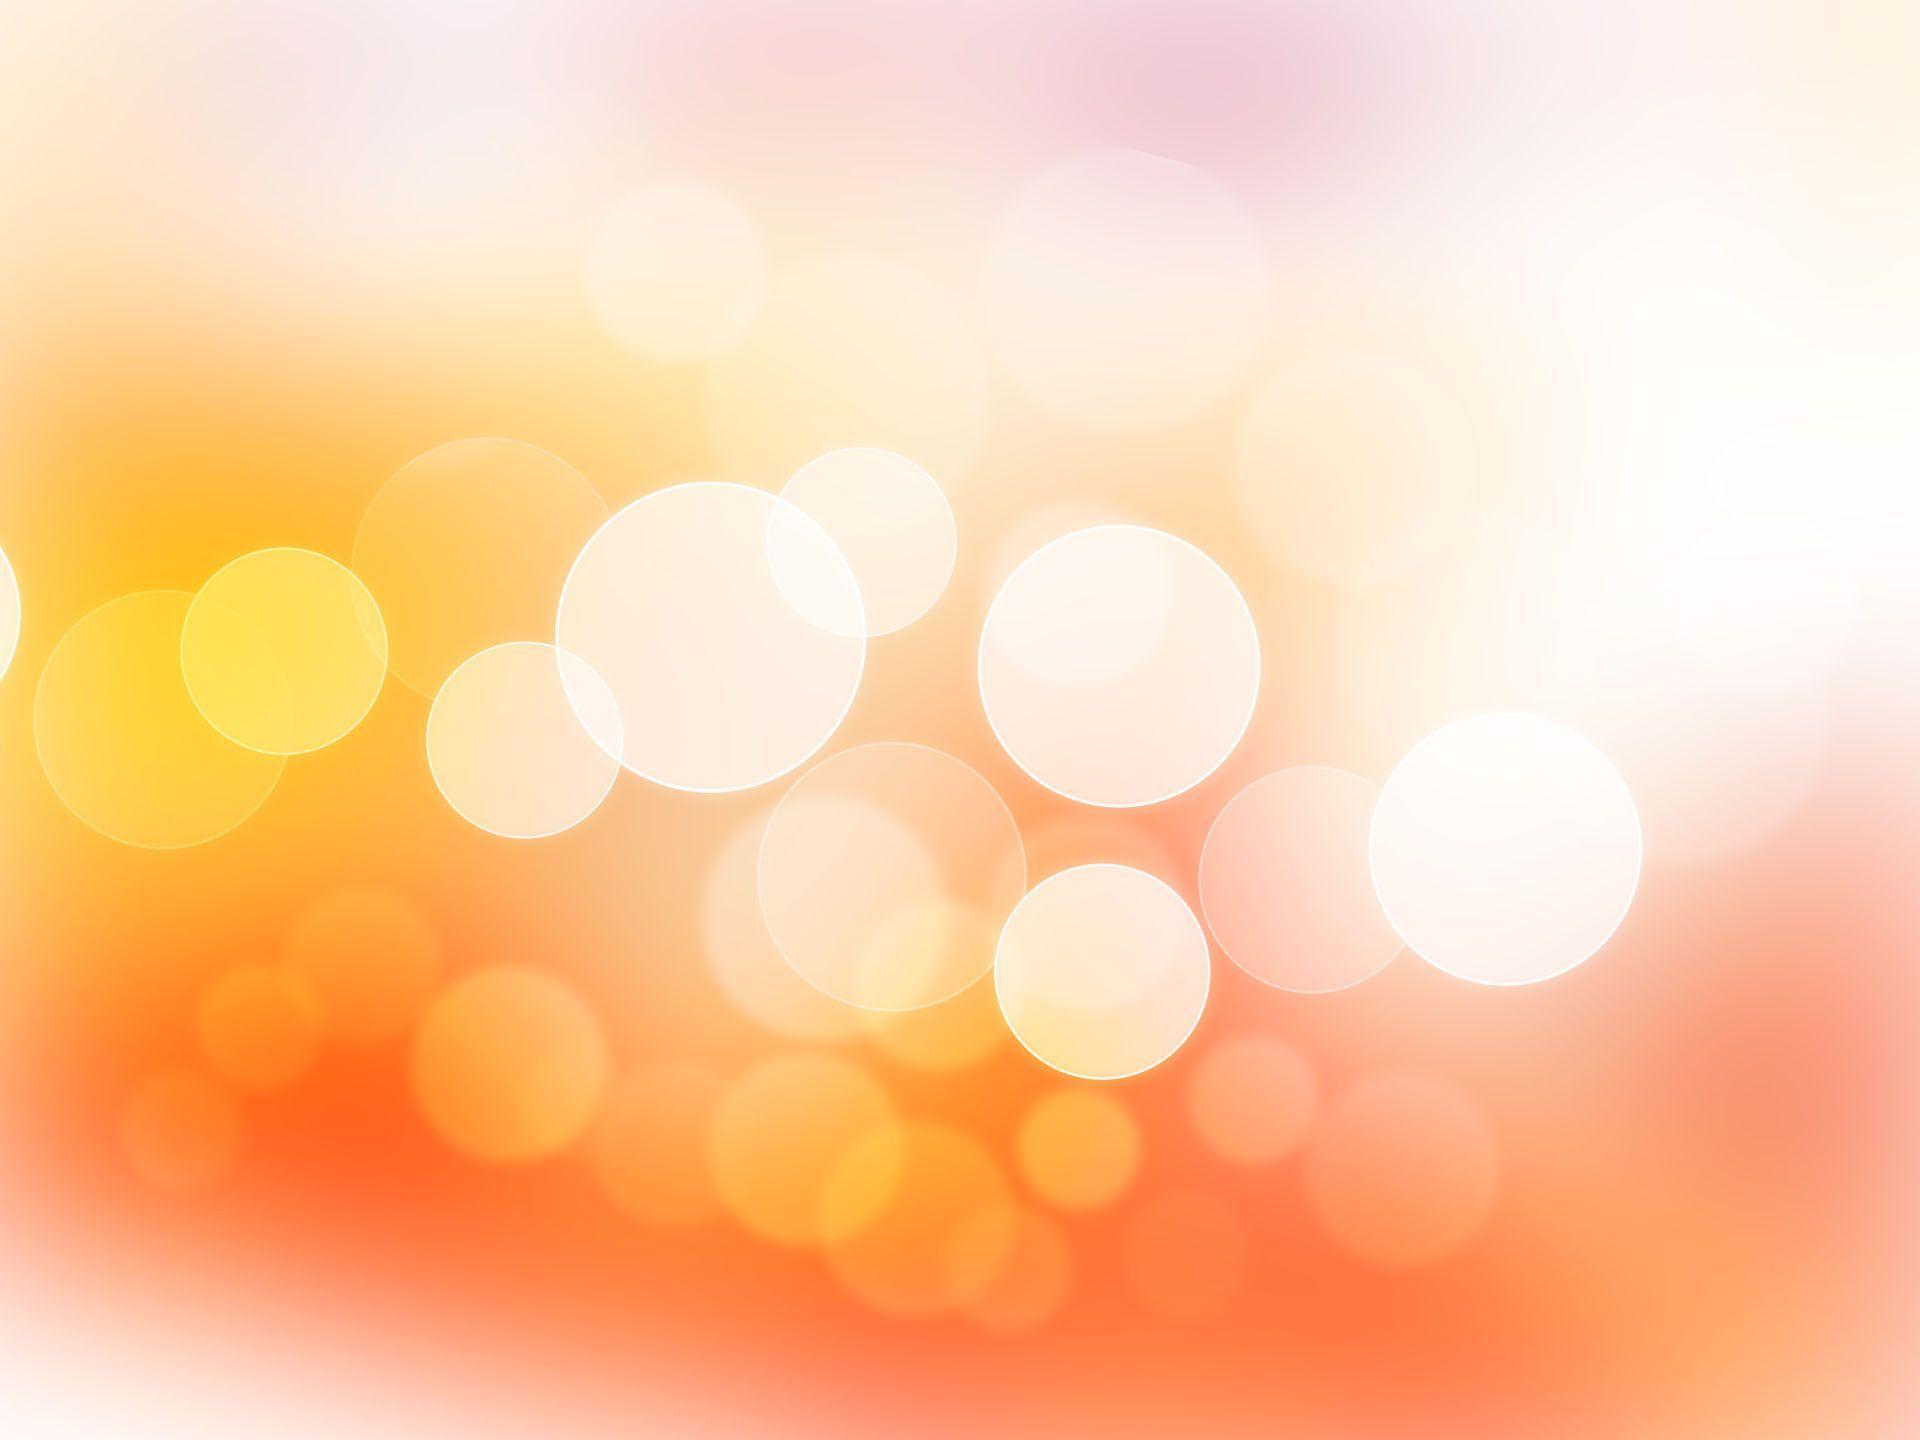 Desktop Wallpapers » D Backgrounds » Orange D Ball » www ... for Light Orange Background Wallpaper  585ifm